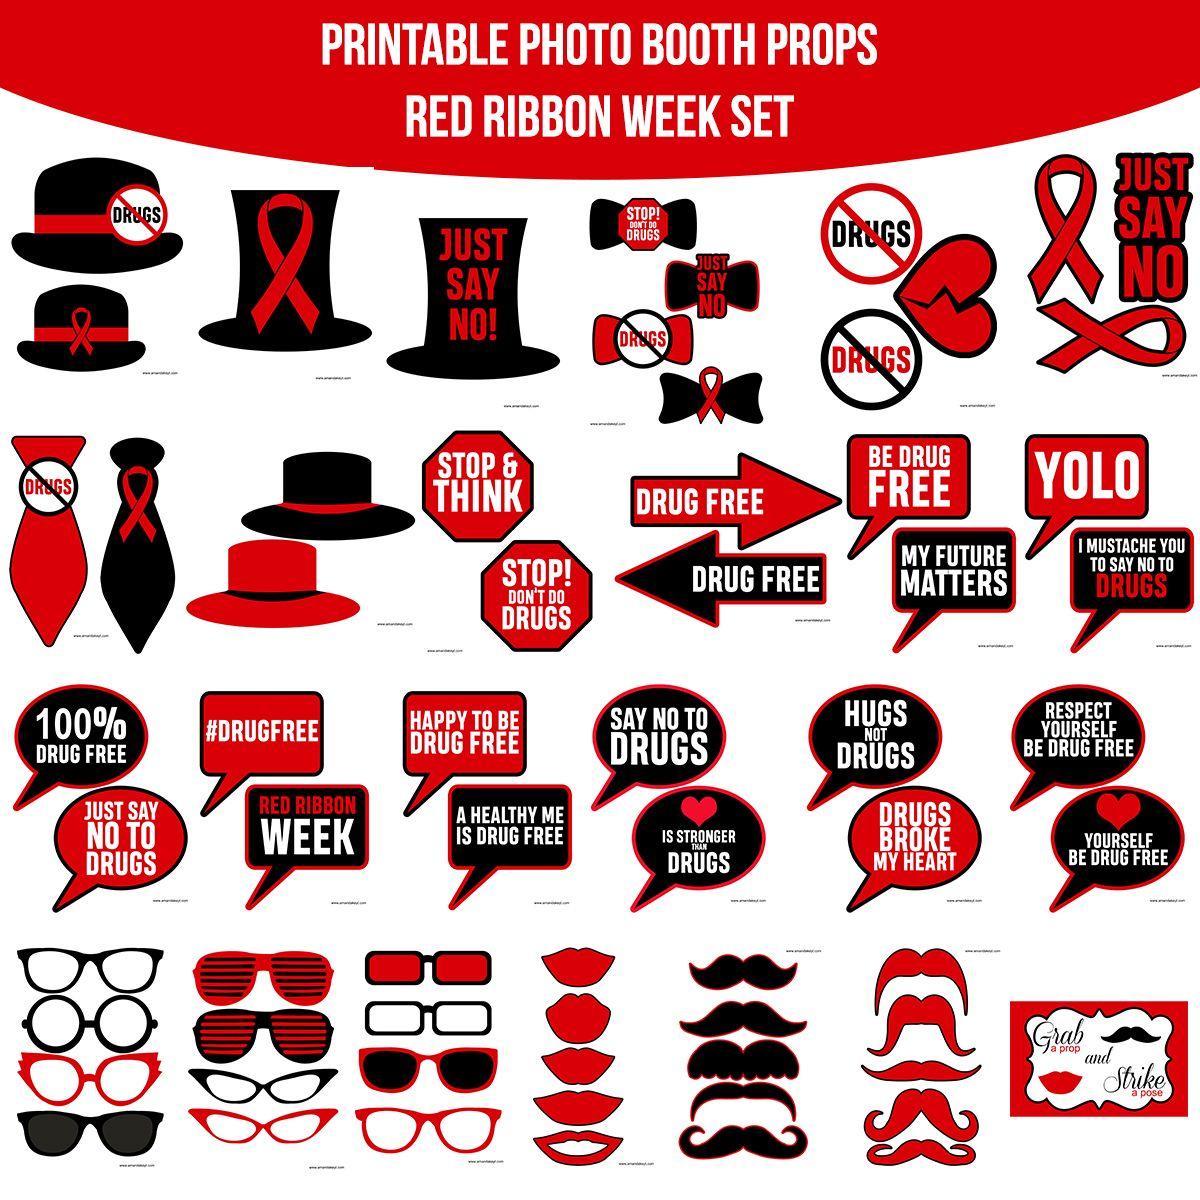 Instant Download Red Ribbon Week Drug Free Printable Photo